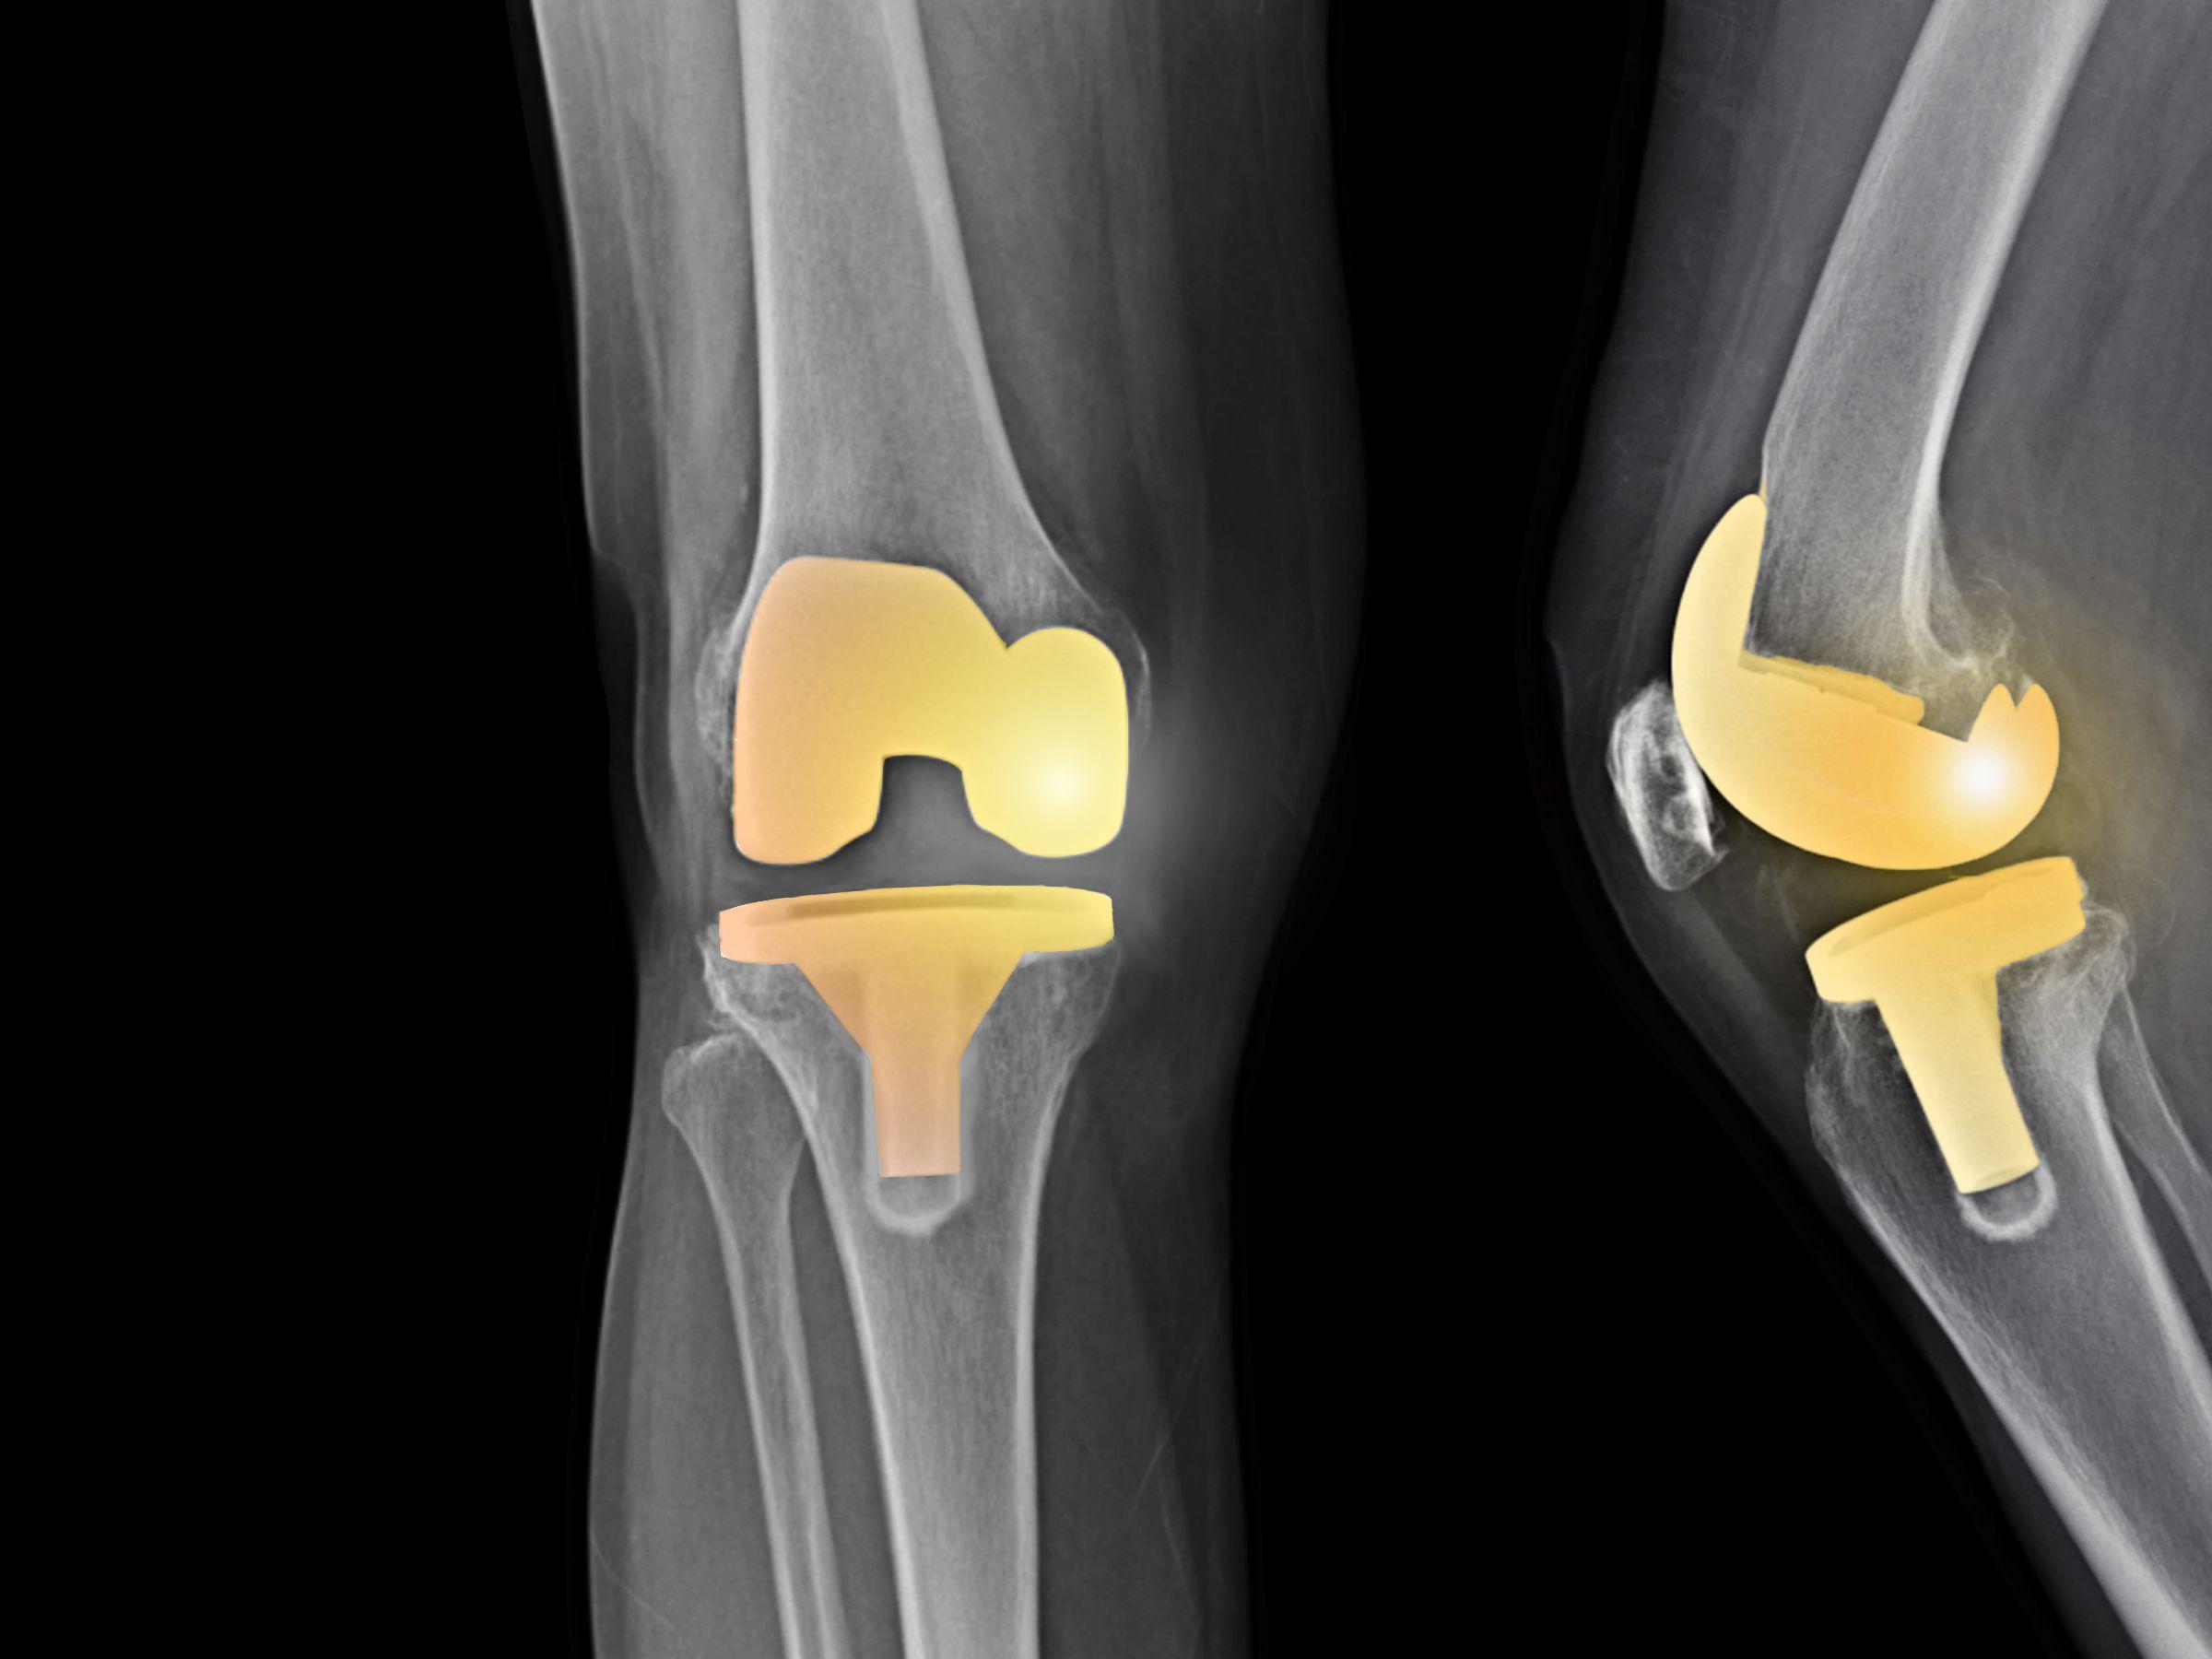 best knee replacement surgeons in michigan)